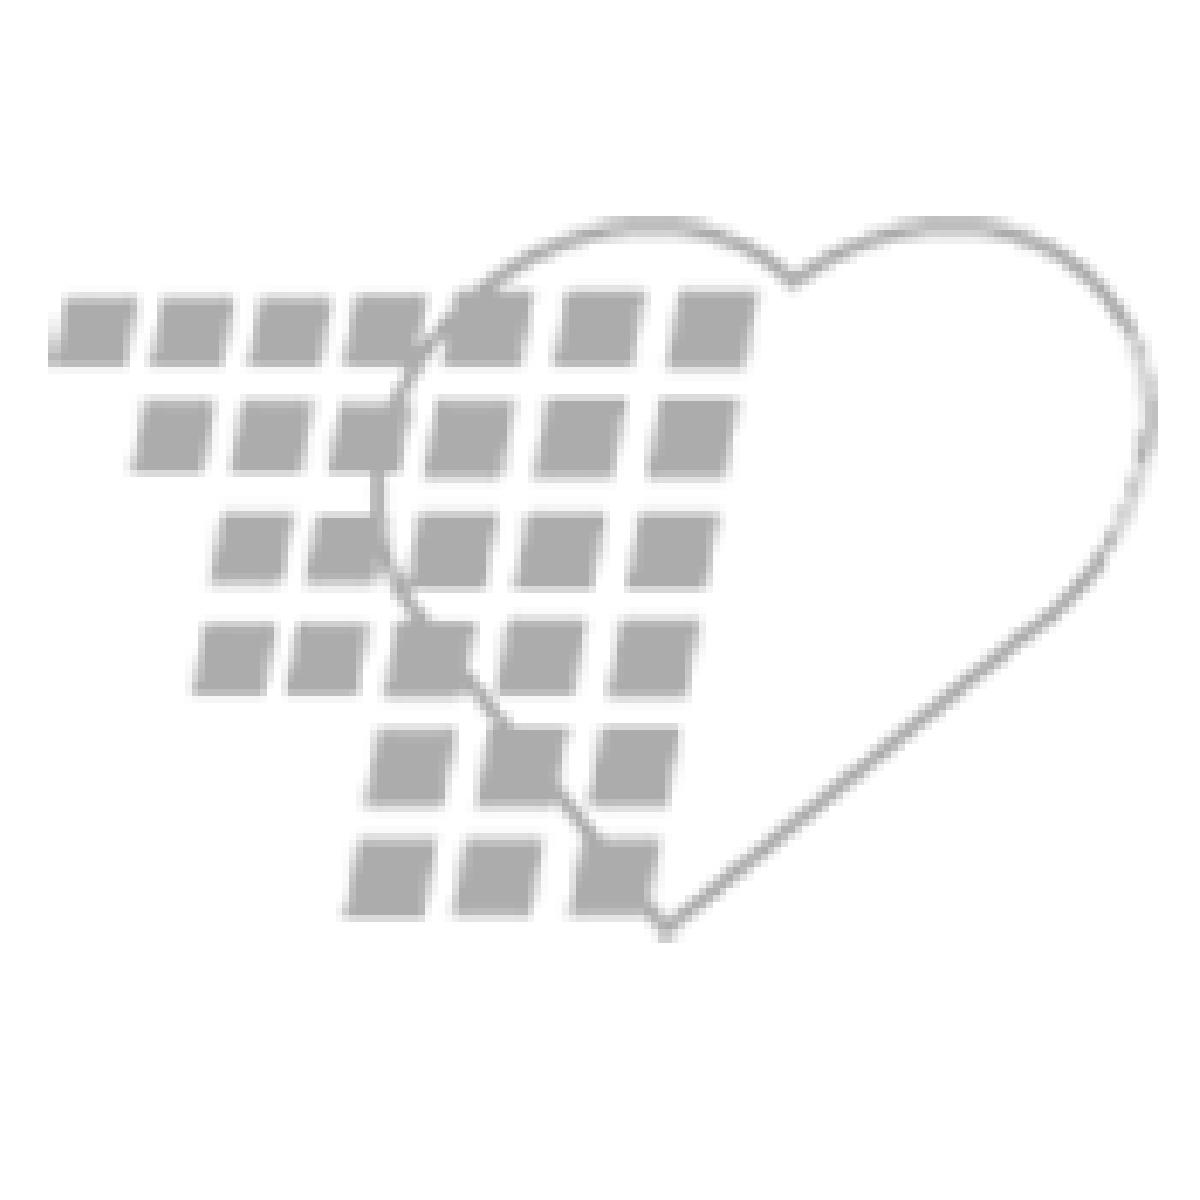 06-93-0063 - Demo Dose® Misoprostl (Cytotc) 200 mcg- 100 Pills/Box